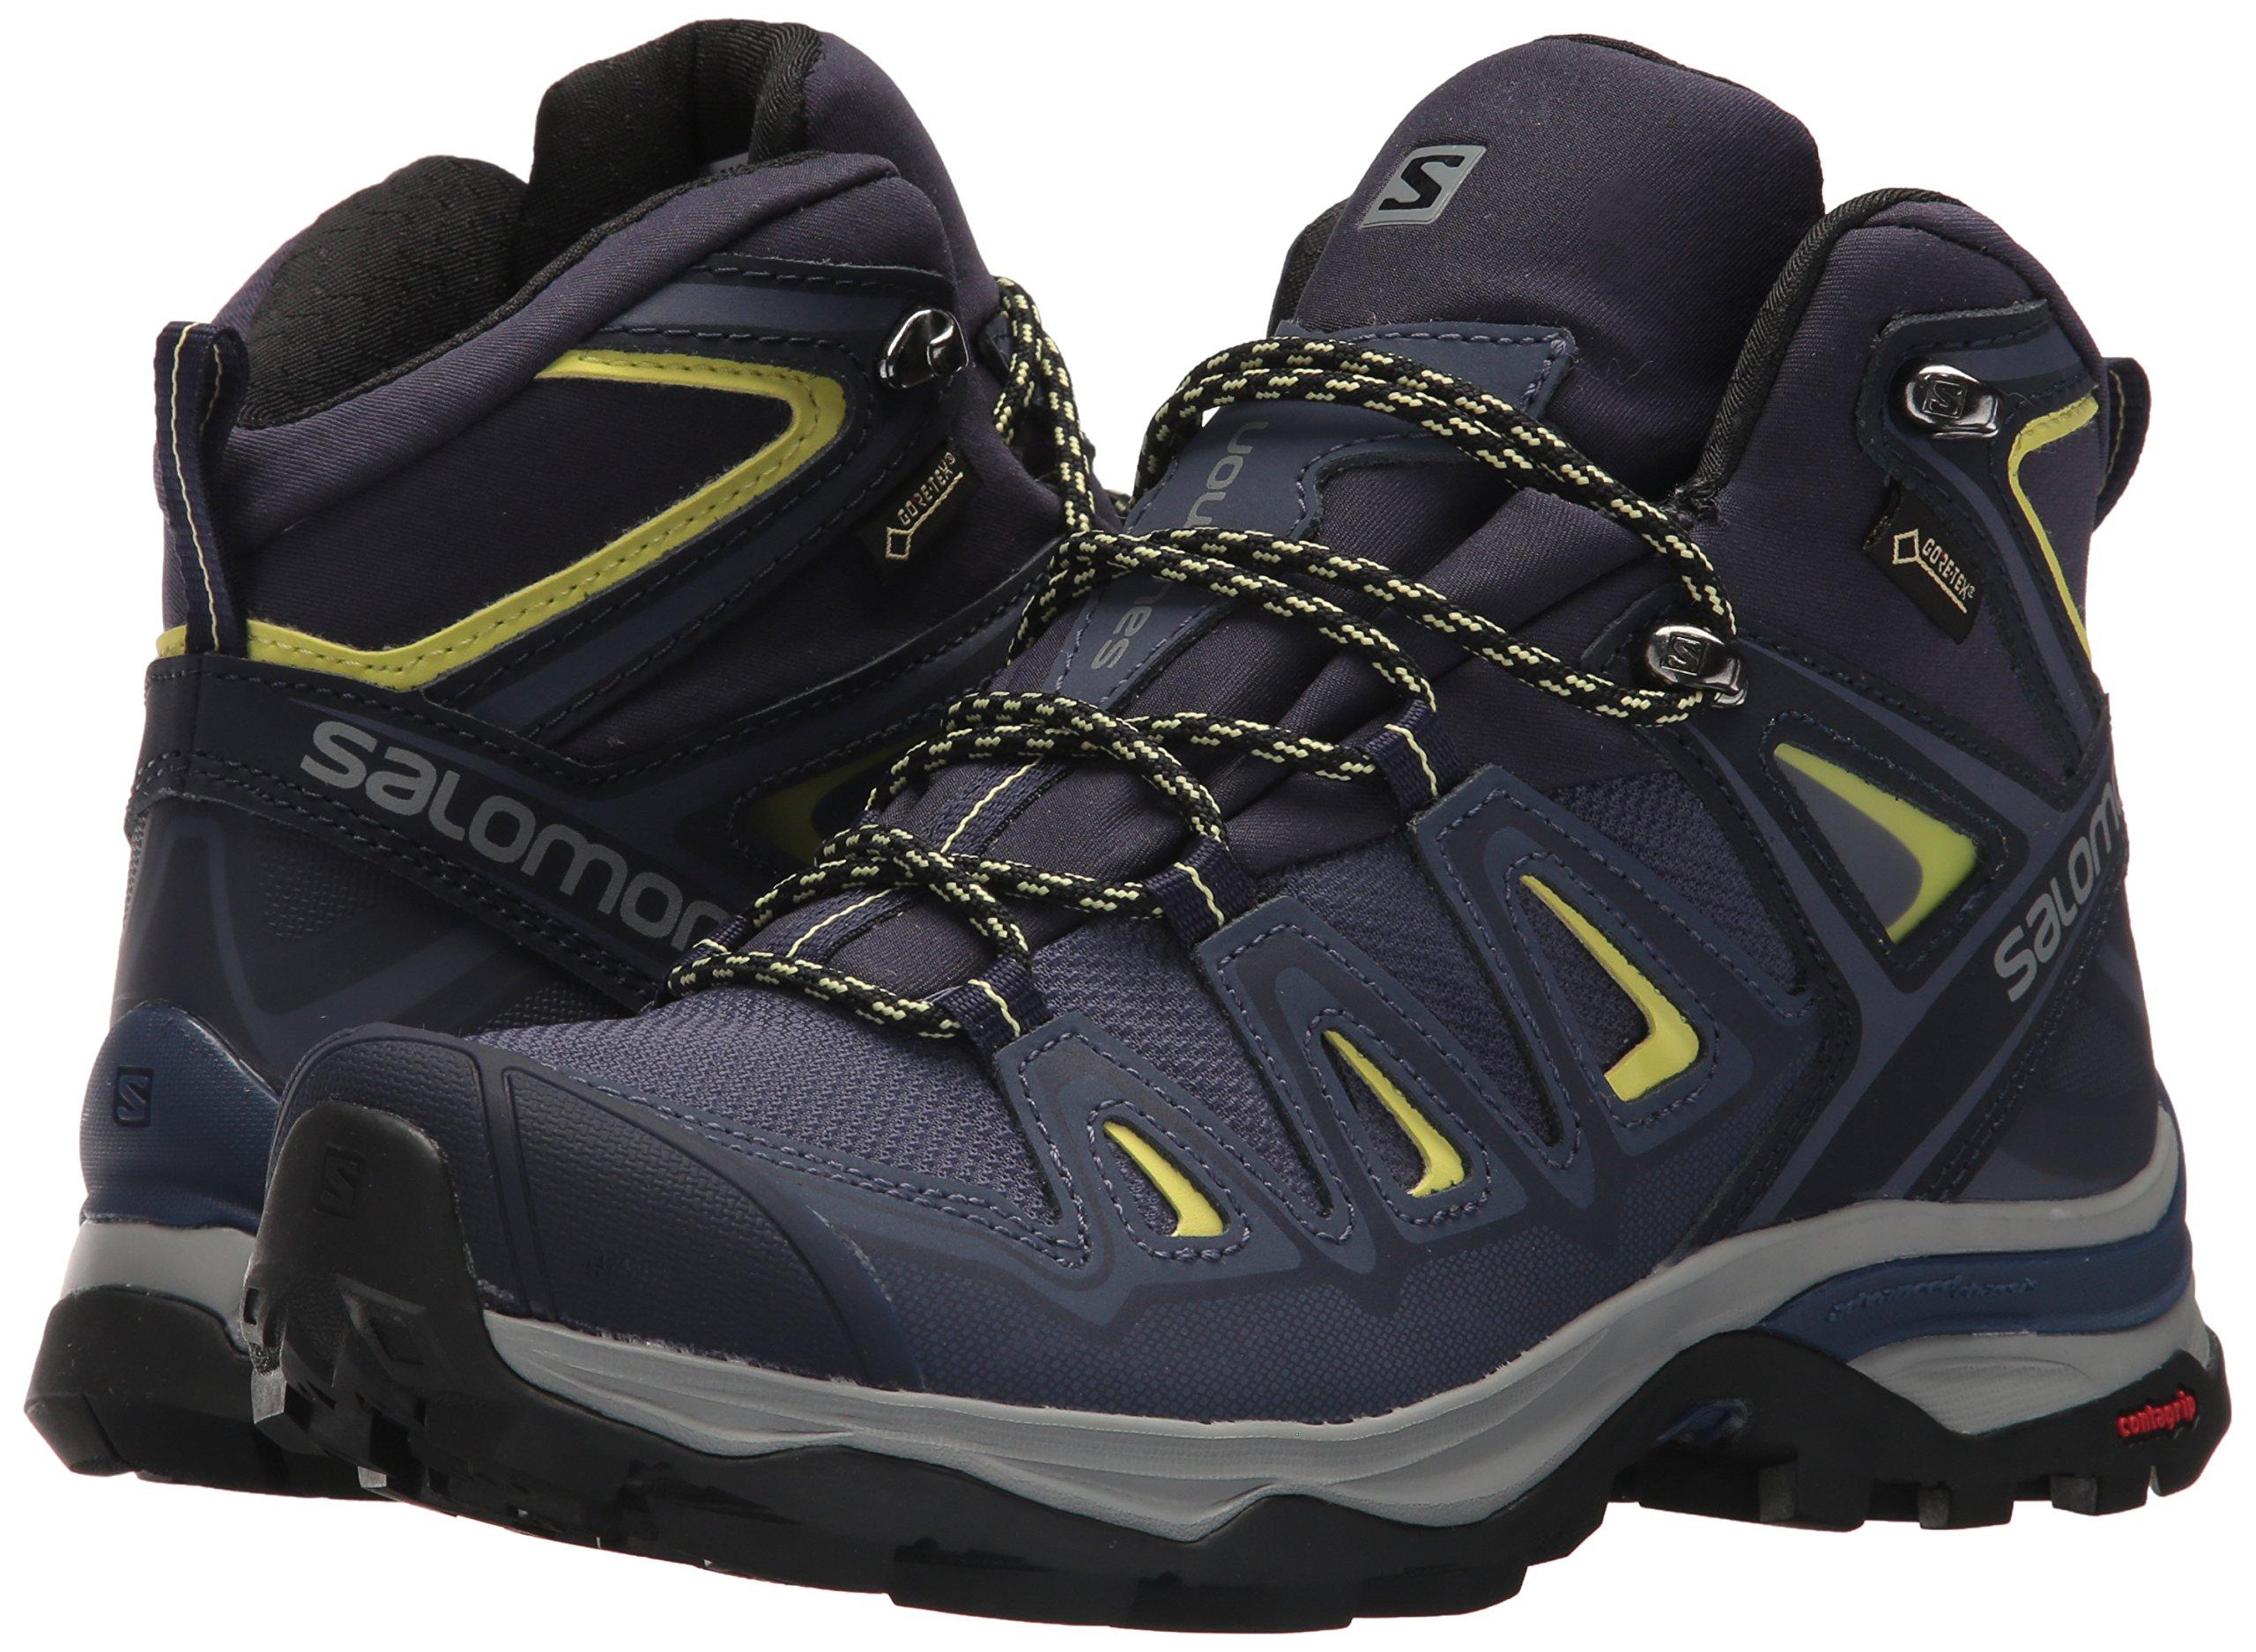 Boot Szcolor Gtx W cr Details About Women's Hiking Choose 3 Salomon Mid X Ultra 80kwXnOP